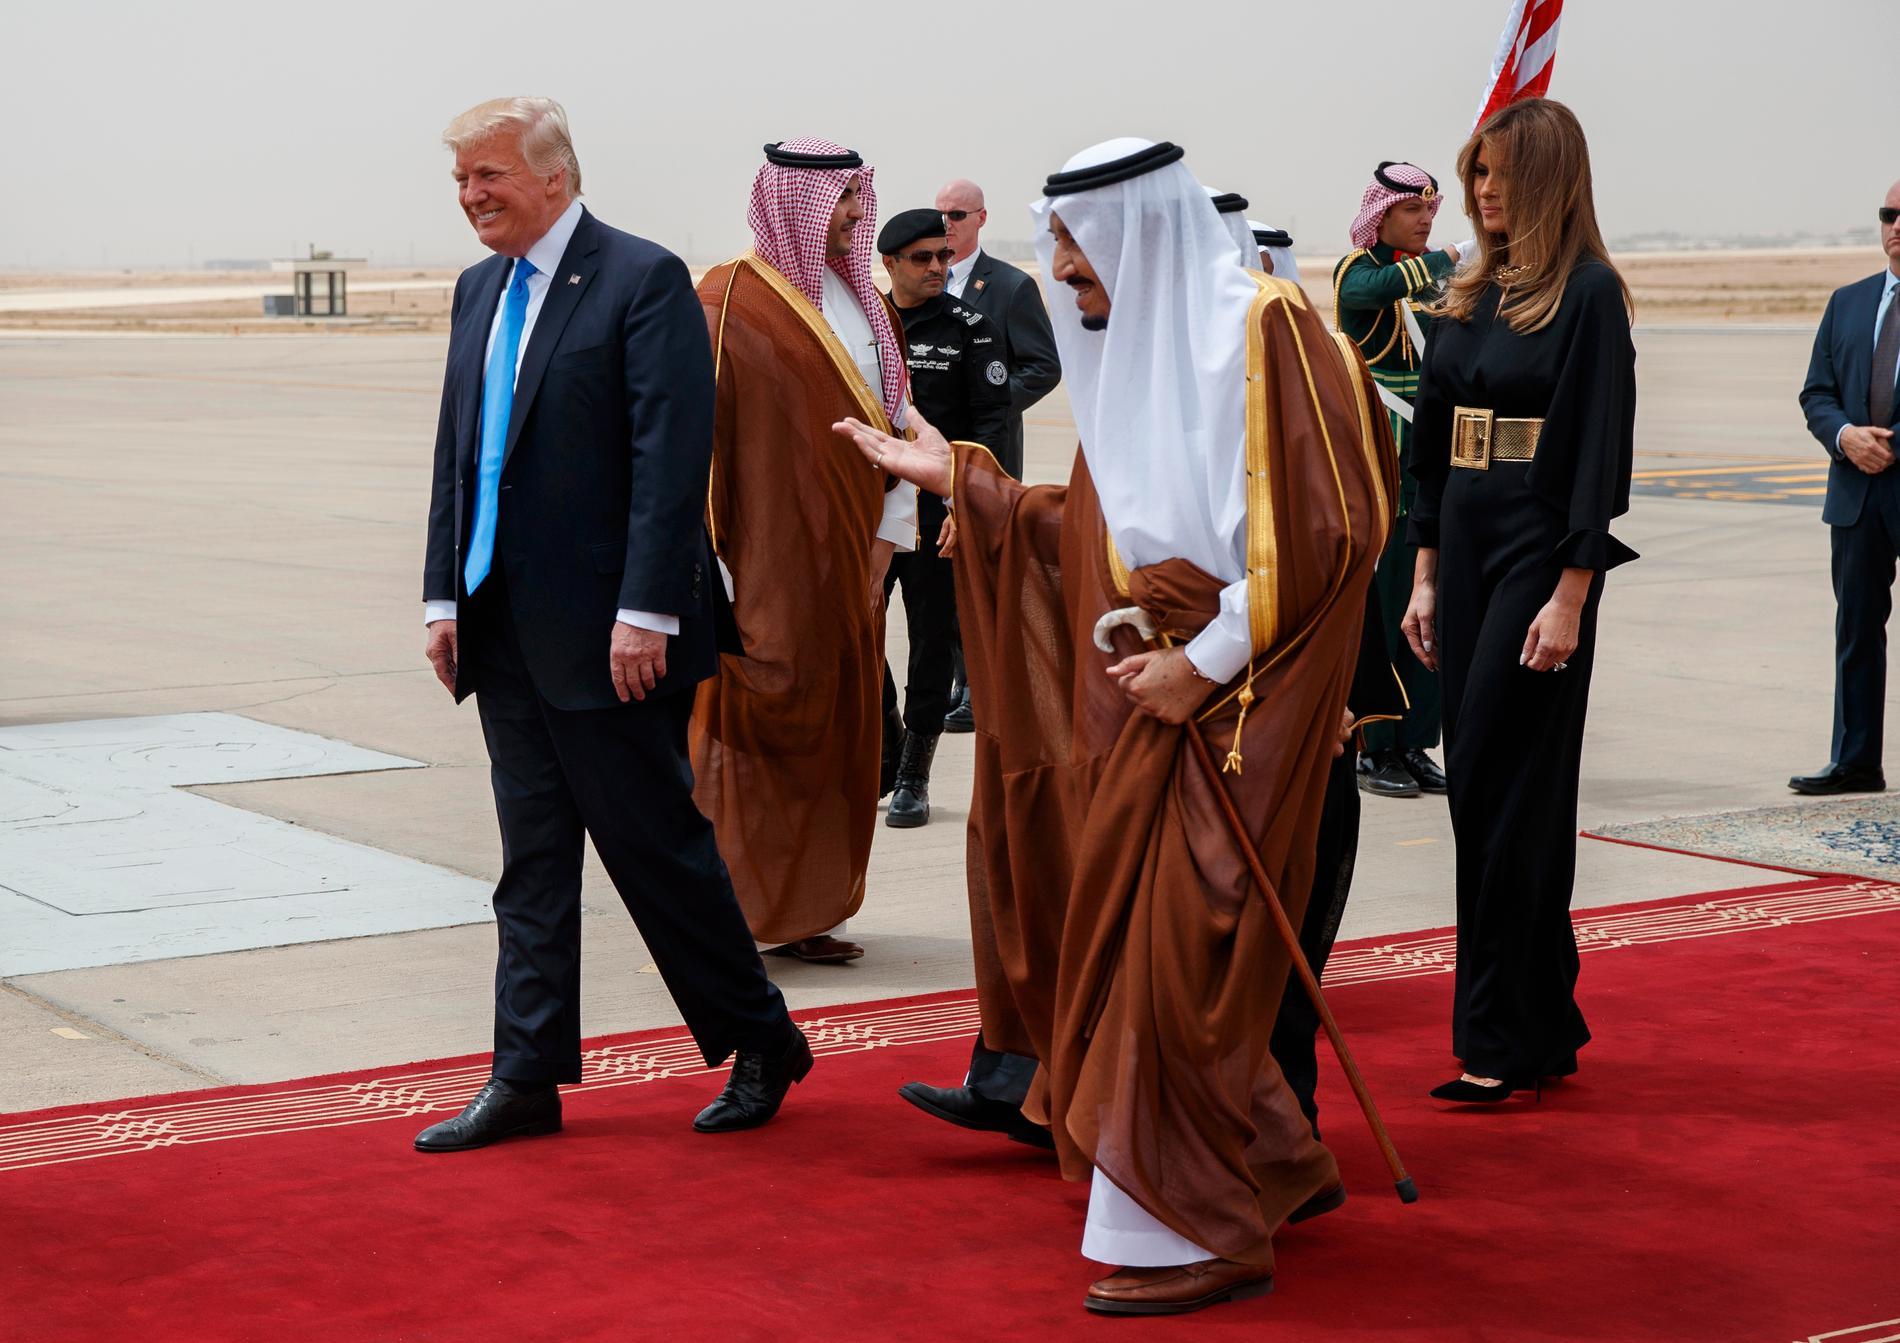 USA:s president Donald Trump tillsammans med Saudiarabiens kung Salman bin Abdulaziz al-saud.